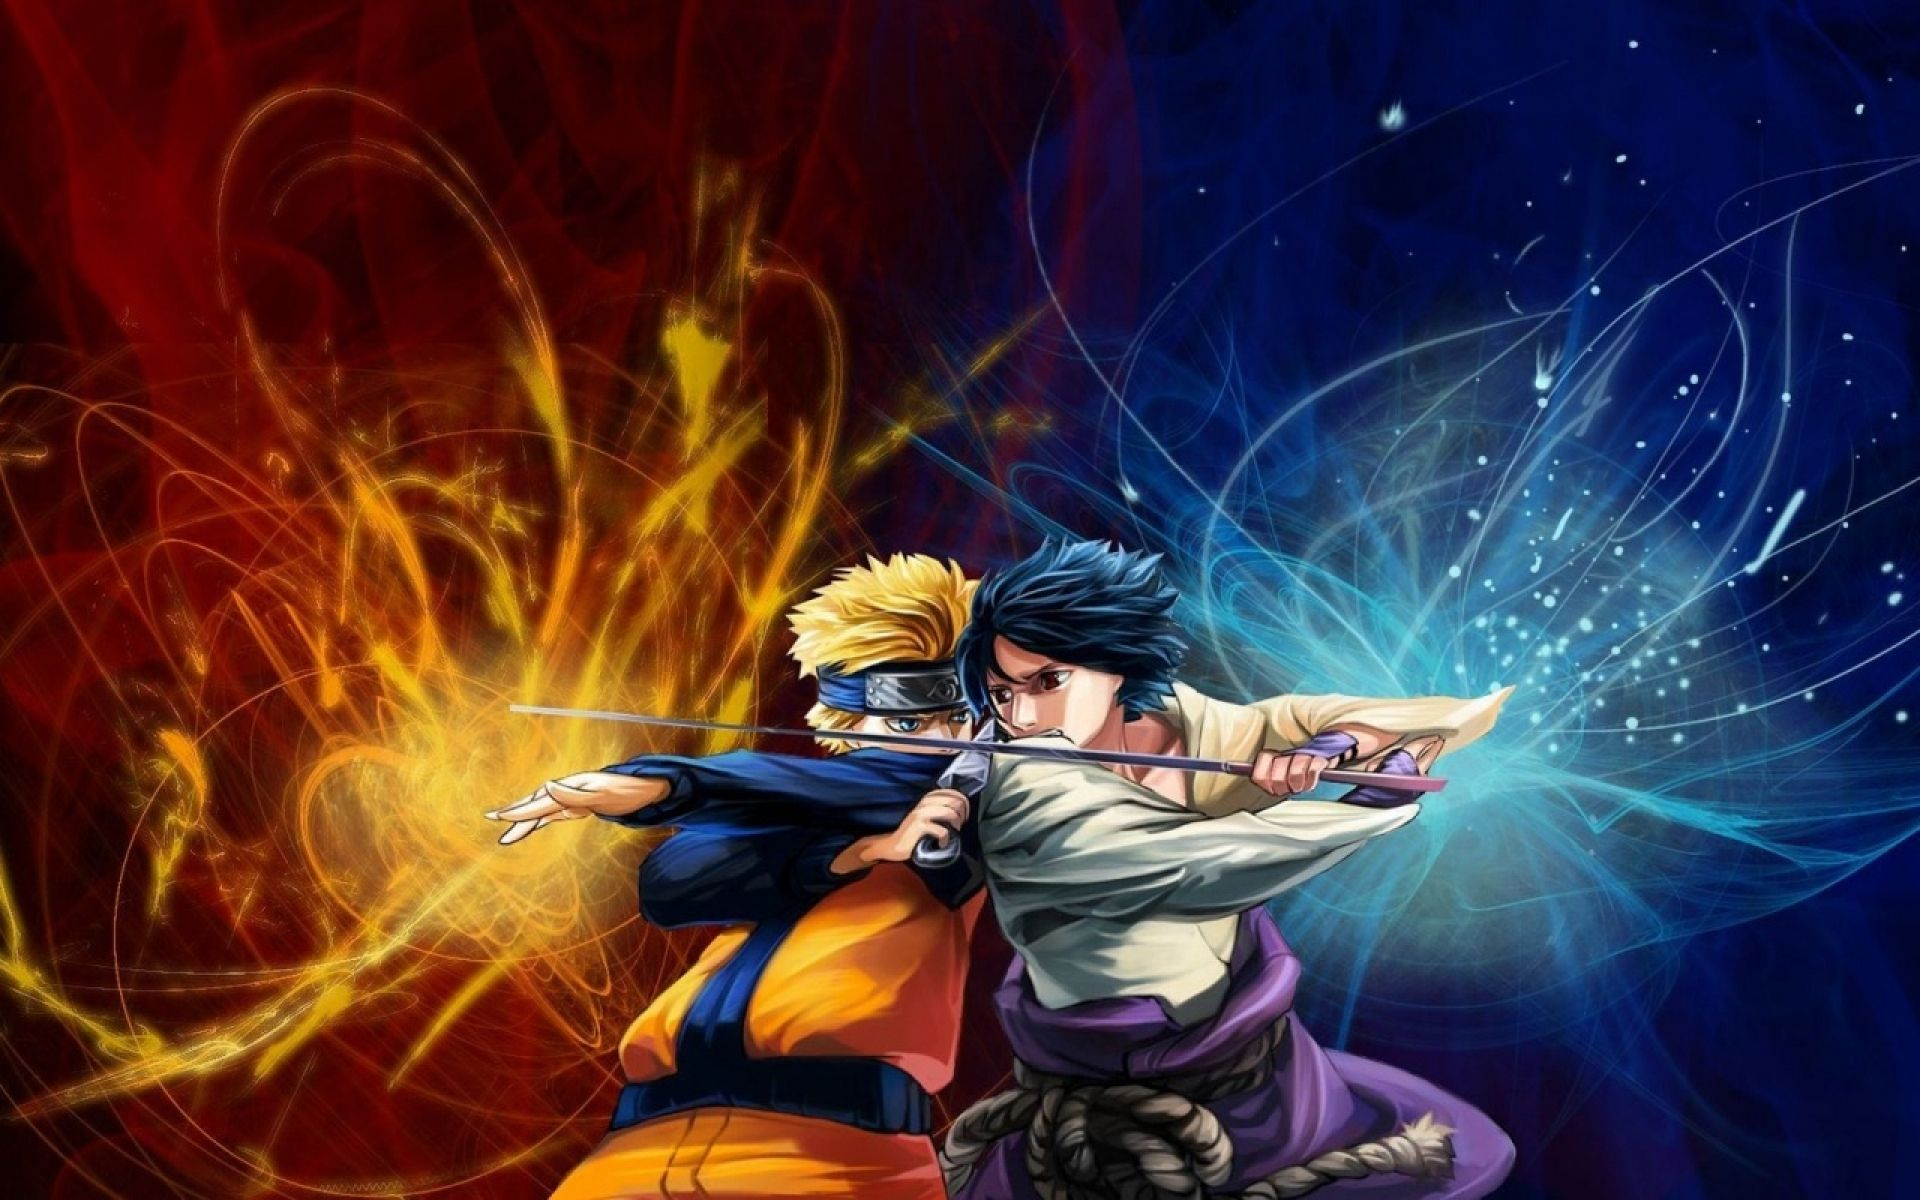 Download Wallpaper Naruto Top - 4d4a9ebcc2172782a35dfae276ad3035  Image.jpg